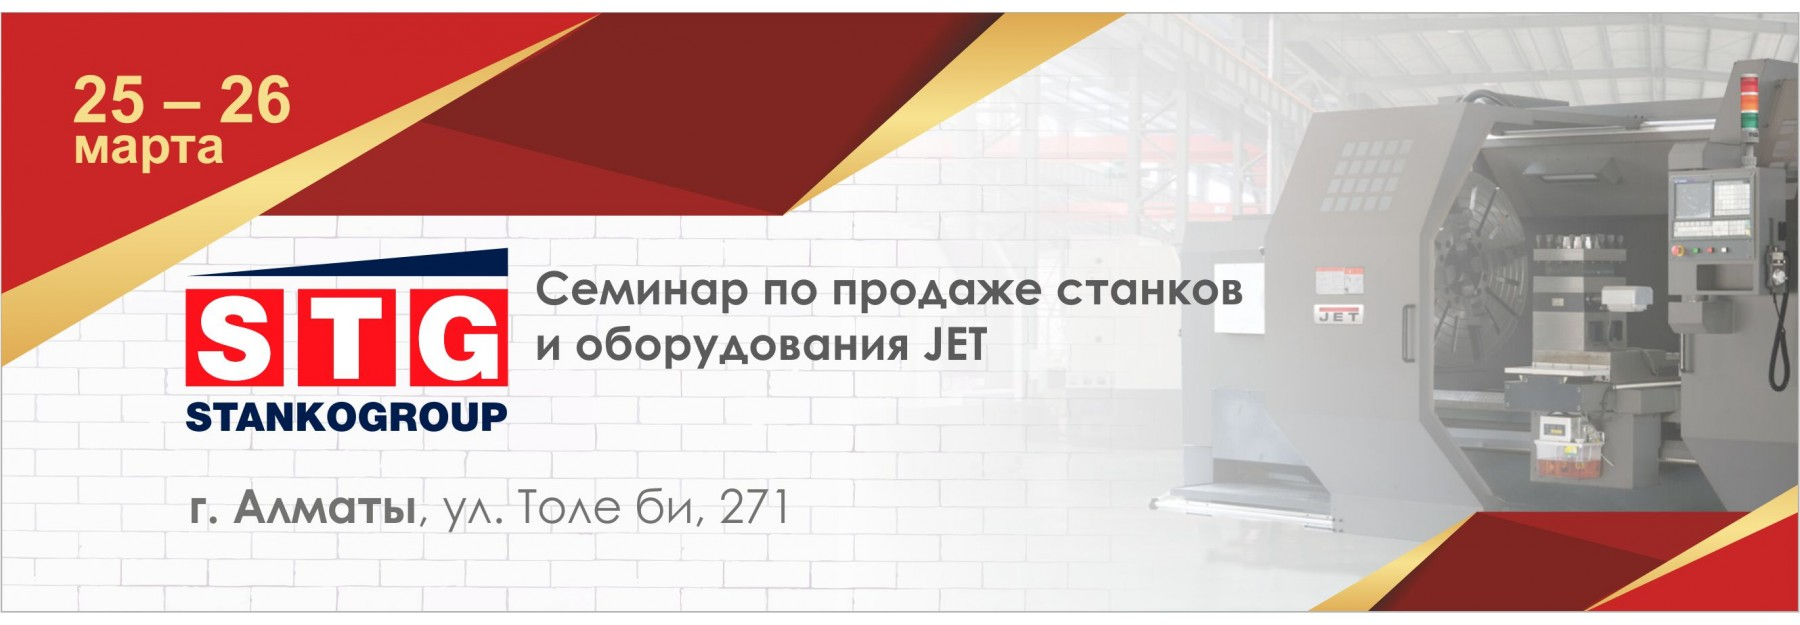 Семинар по продаже станков и оборудования JET